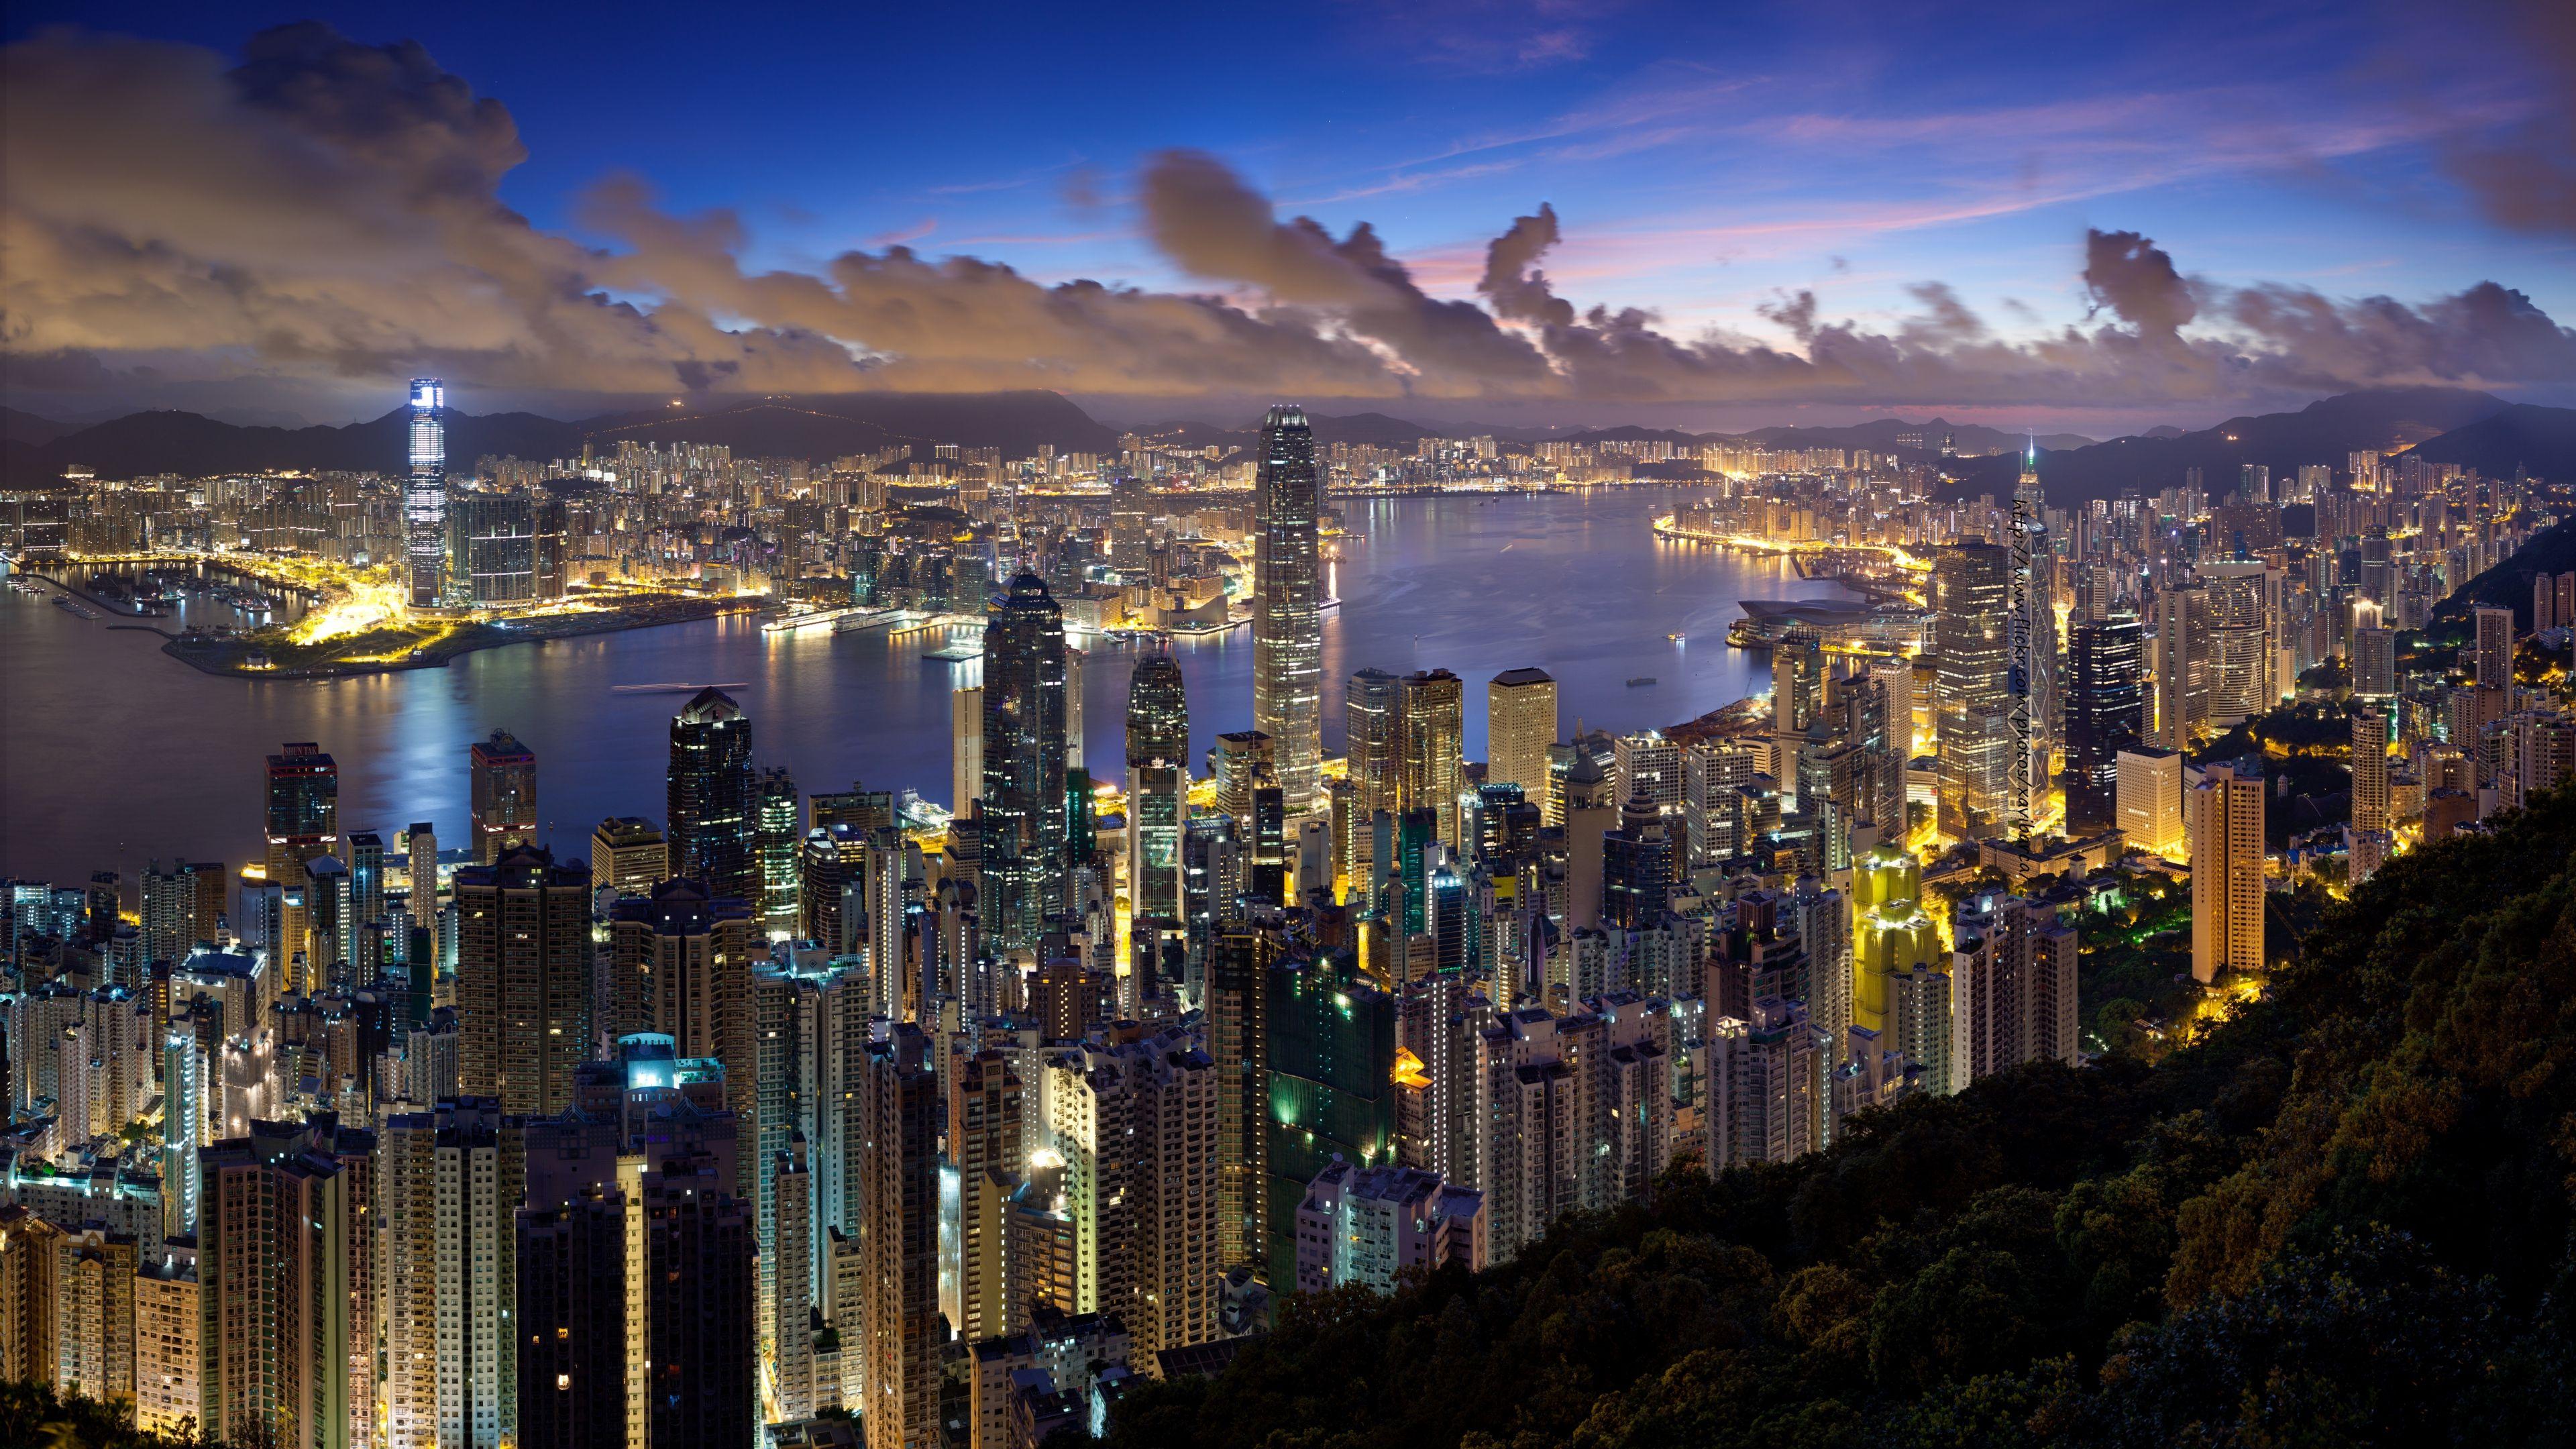 hong kong night wallpaper city world wallpapers for free download